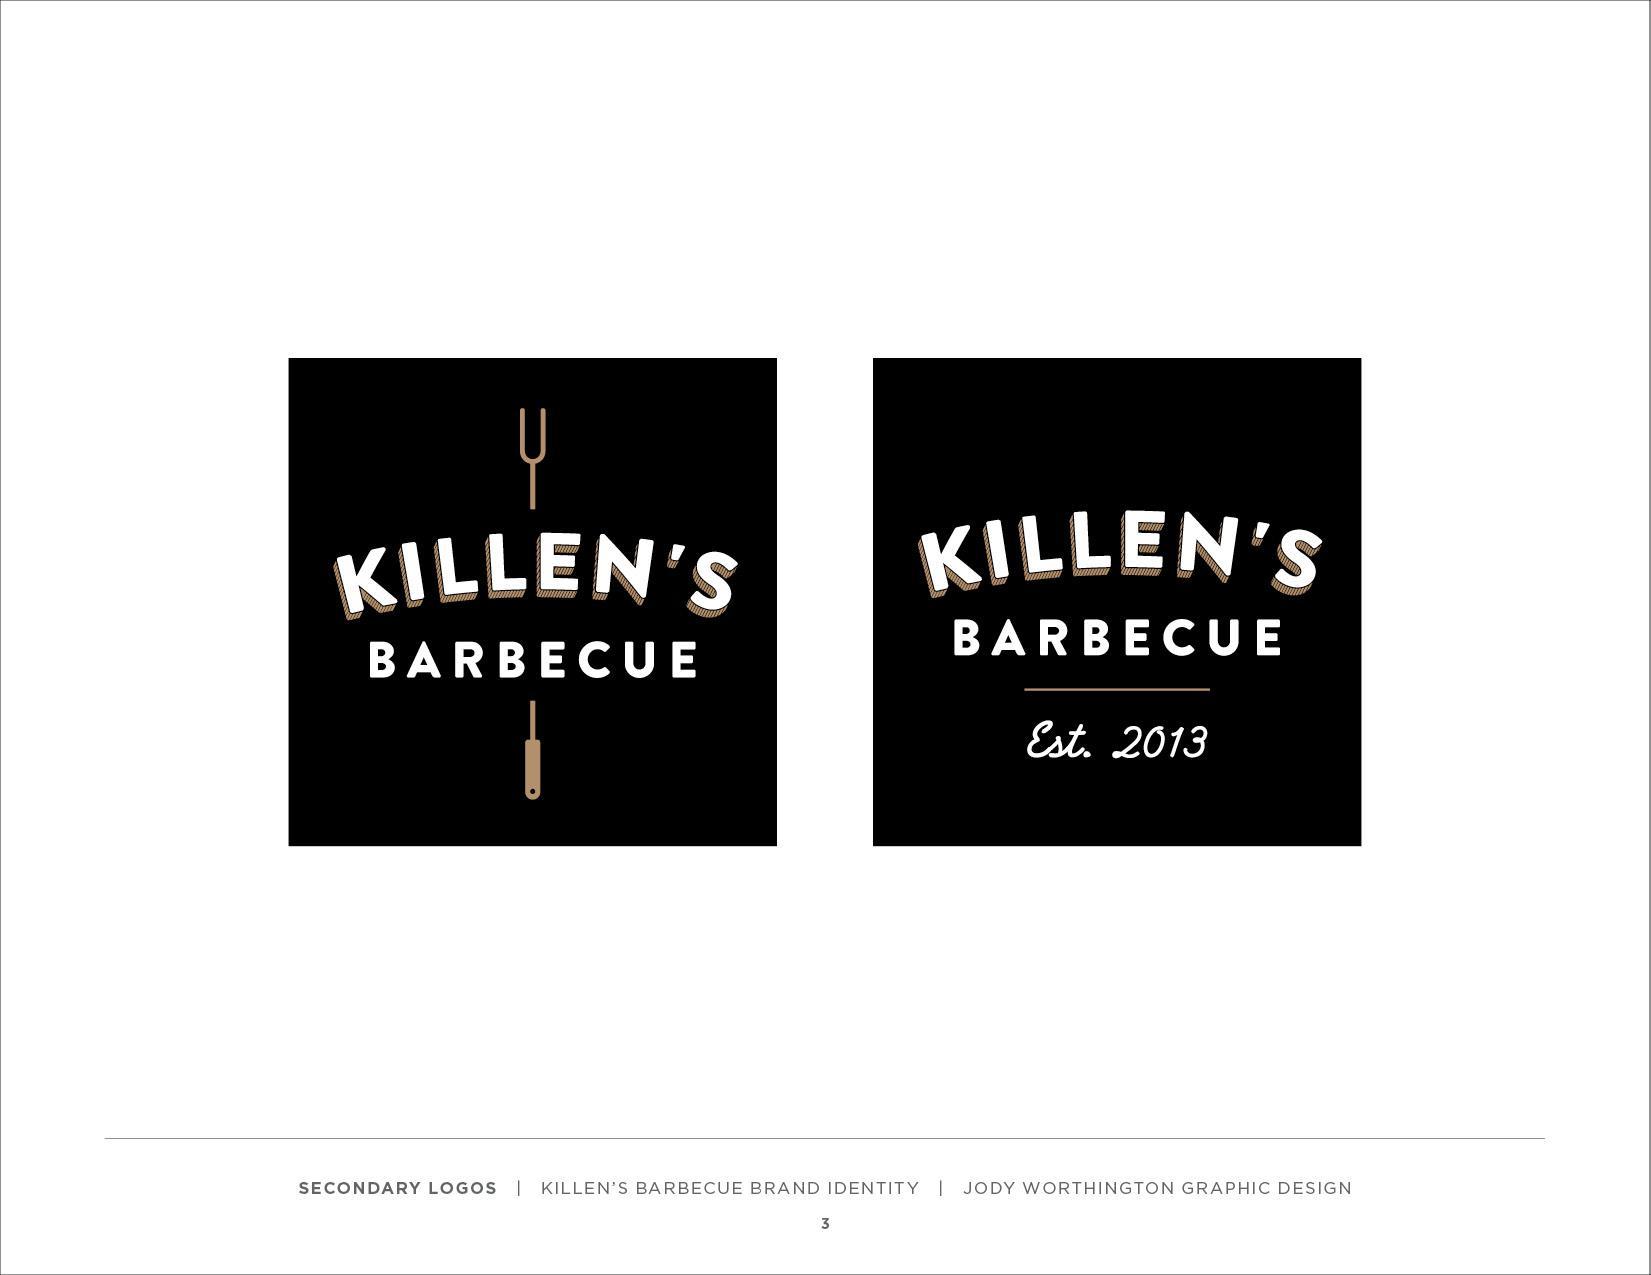 Killen's Barbecue - image 11 - student project